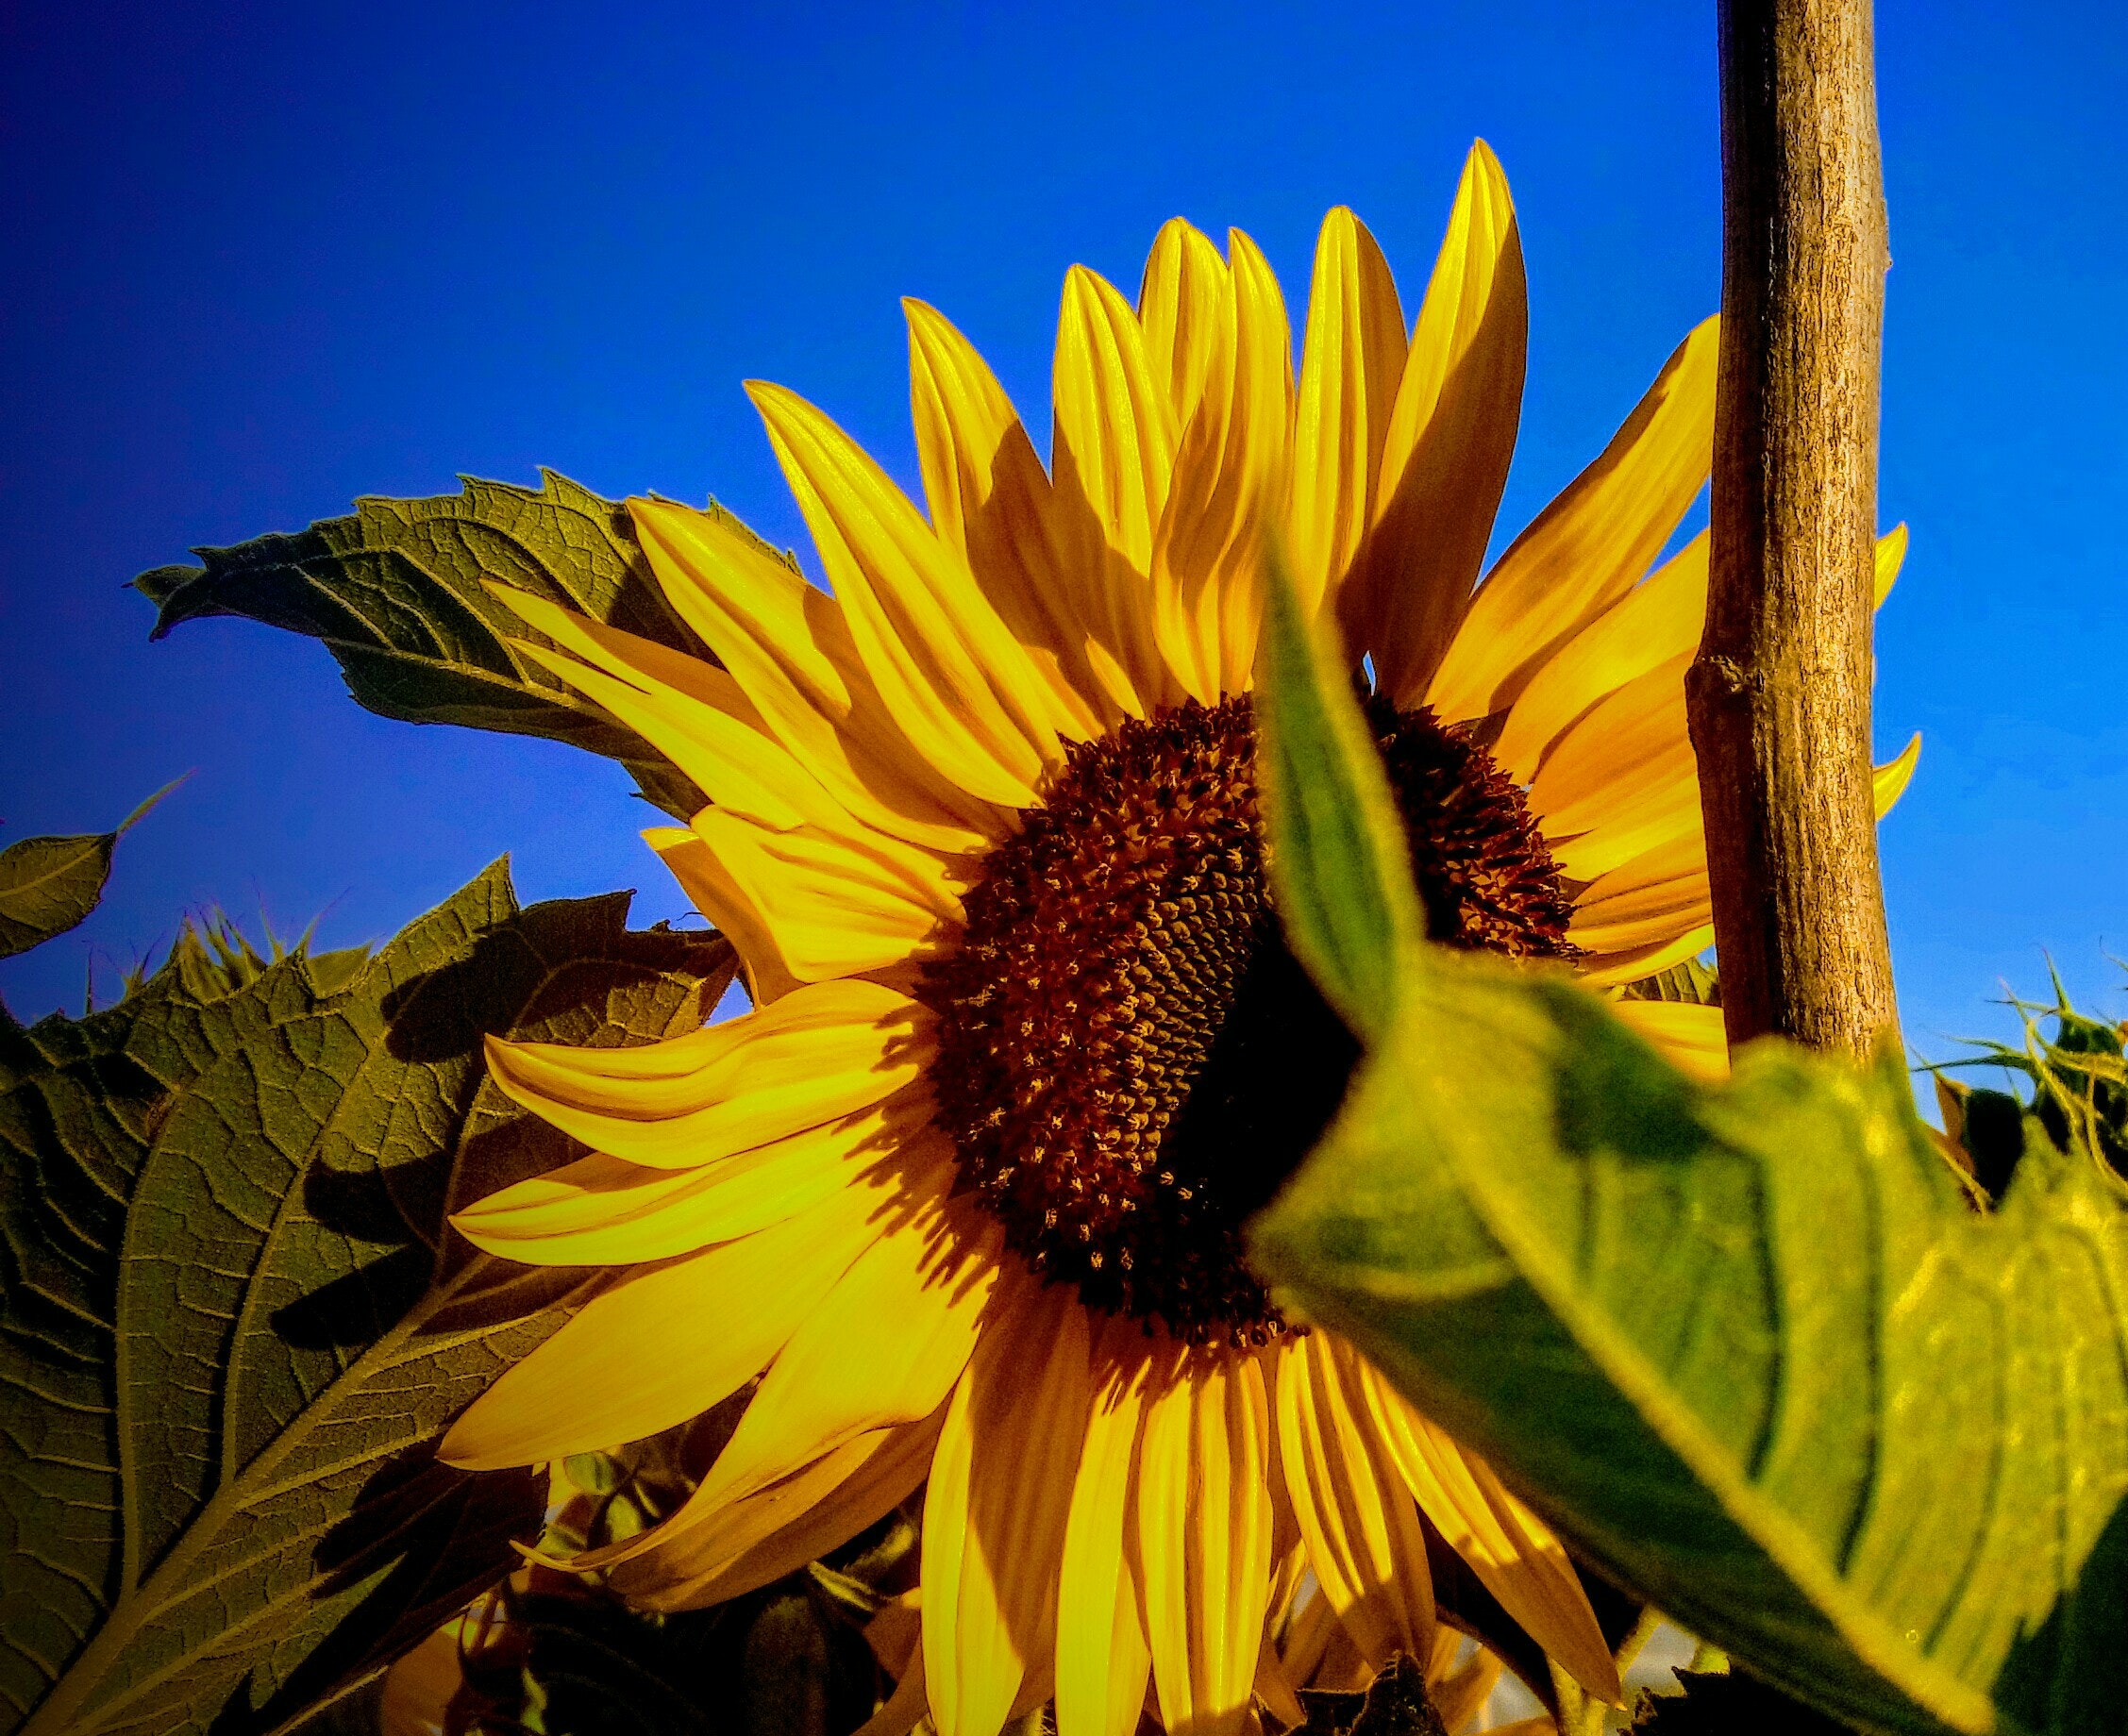 pexels photo 541137.jpeg?cs=srgb&dl=alam bunga matahari bunga bunga indah 541137